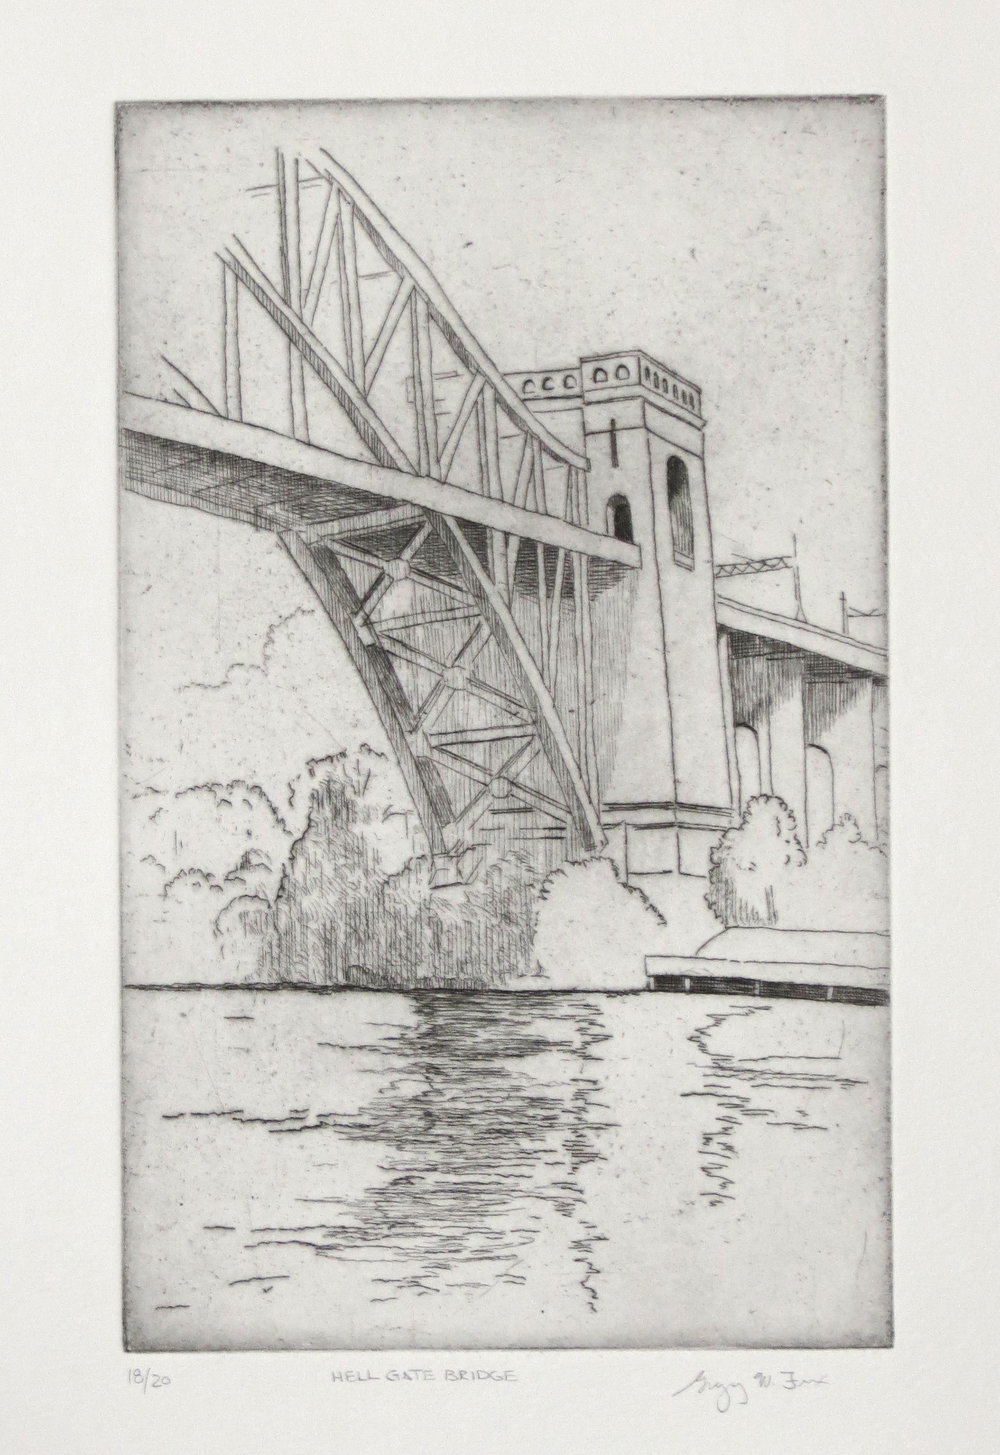 Hell Gate Bridge, etching